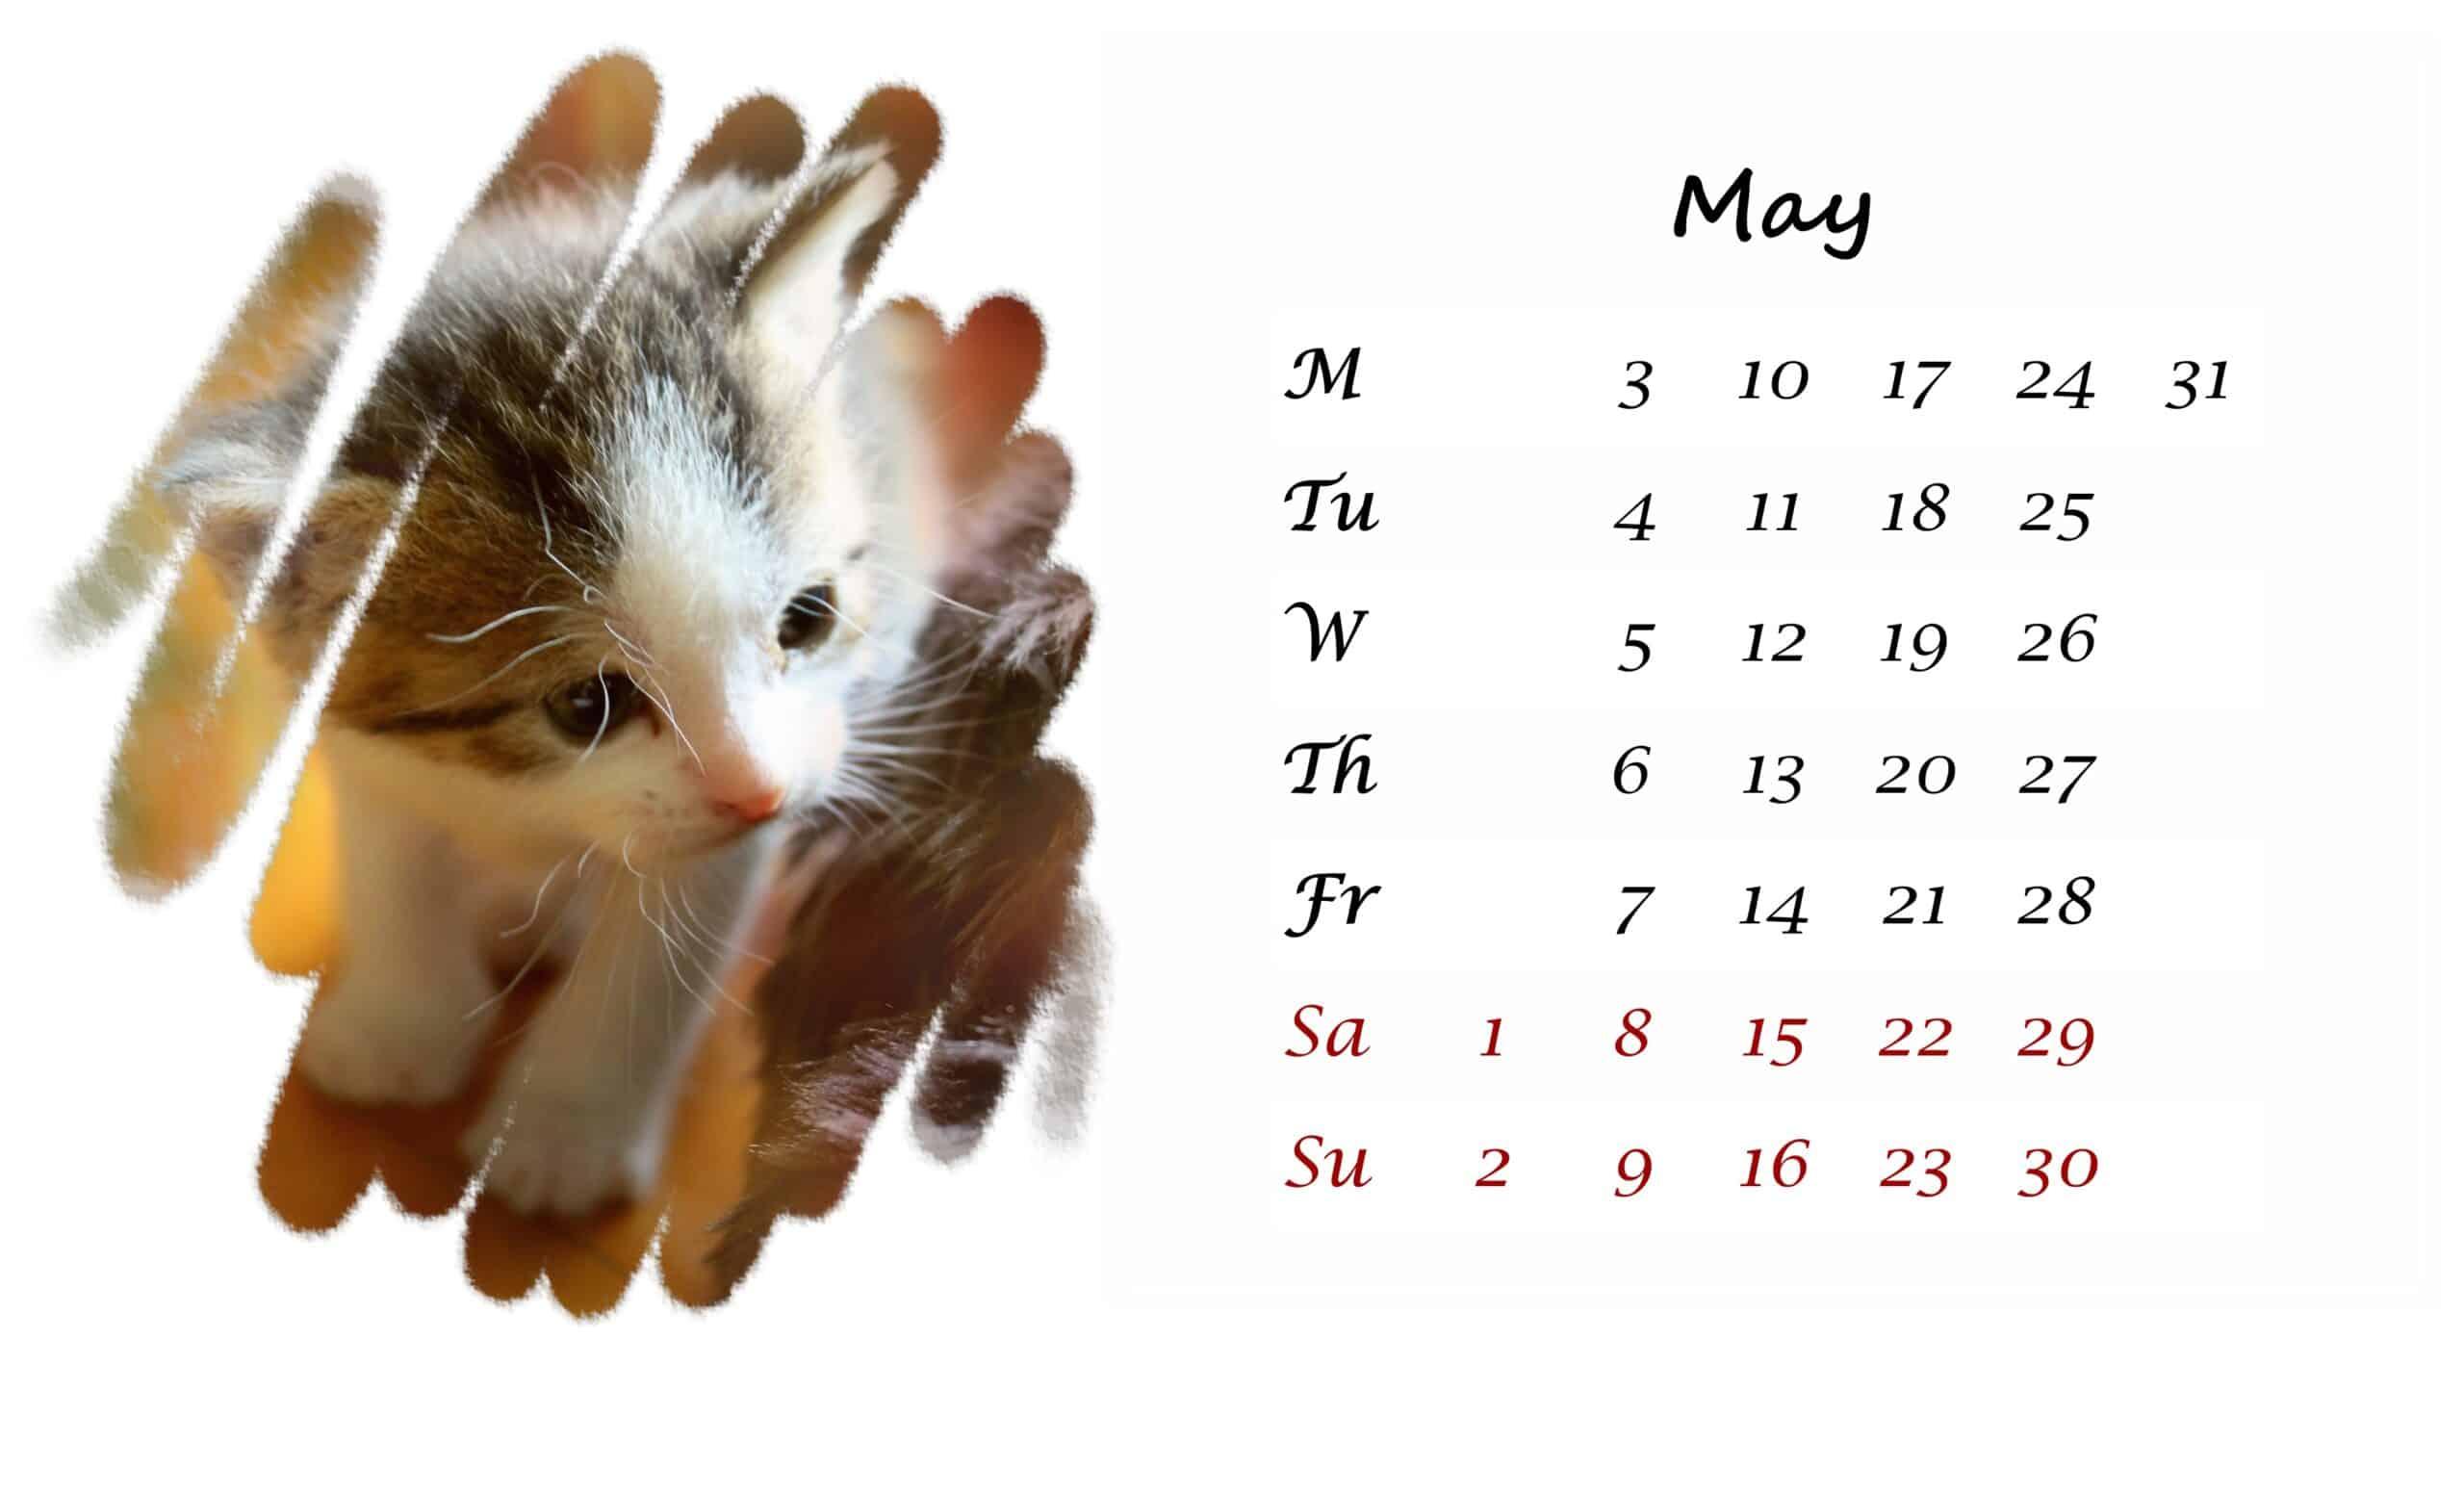 2021 May printable calendar